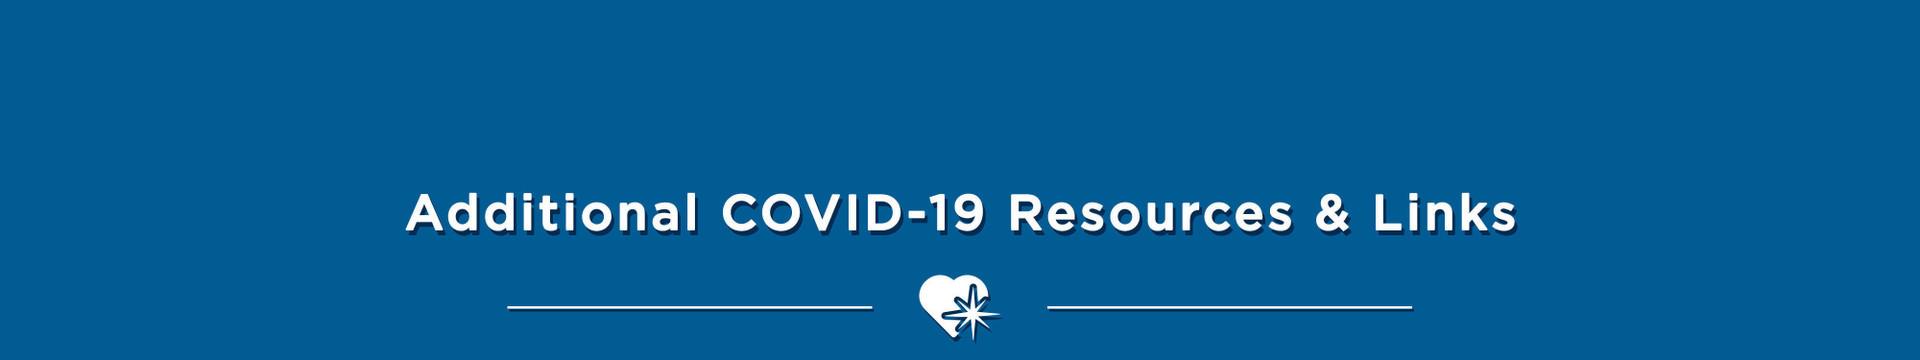 Coronavirus Resources for Virginia